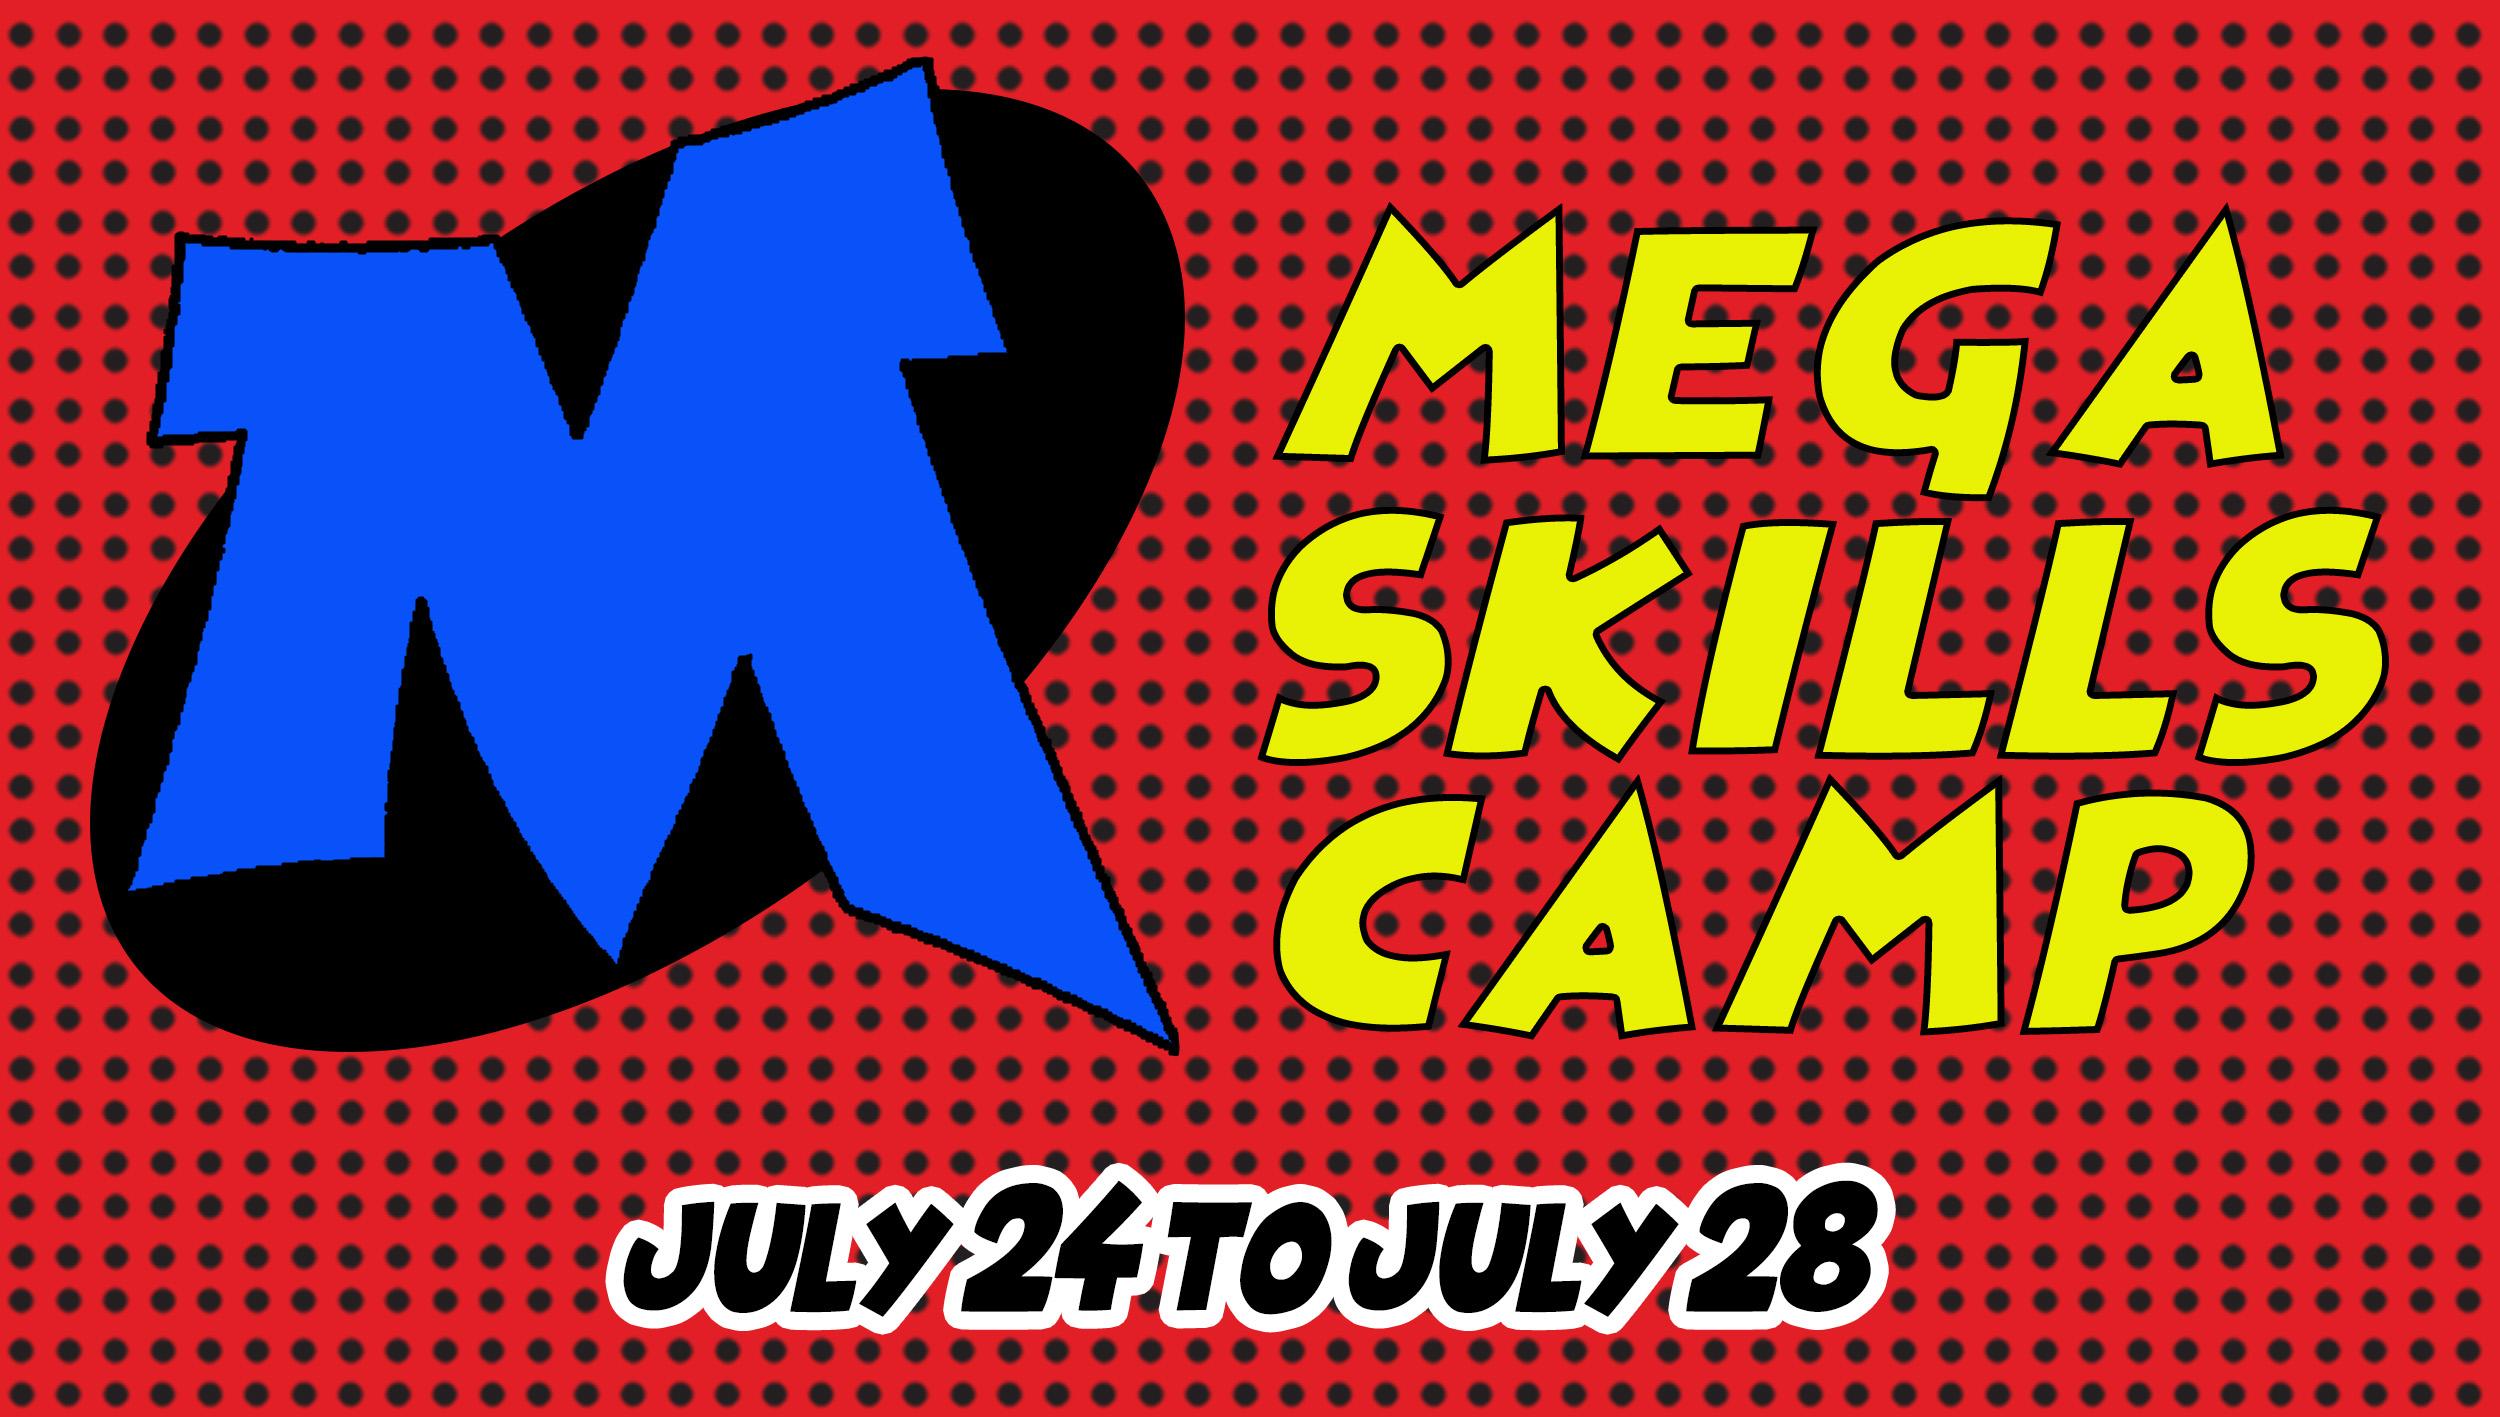 Megaskills2017emailgraphic